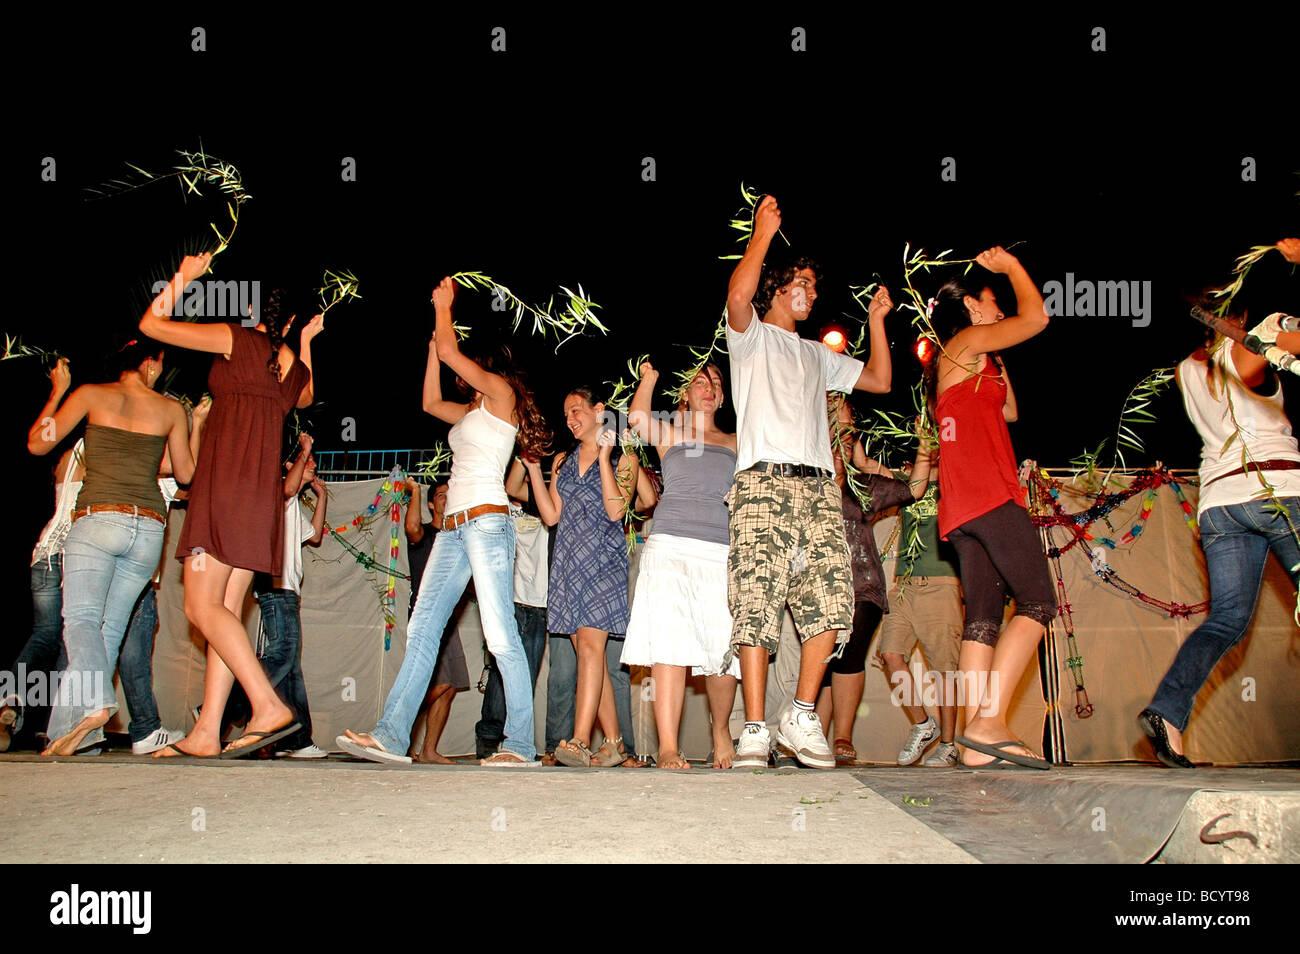 Israel Jordan Valley Kibbutz Ashdot Yaacov Sukkoth celebration The youth group performing the Aravah willow dance - Stock Image